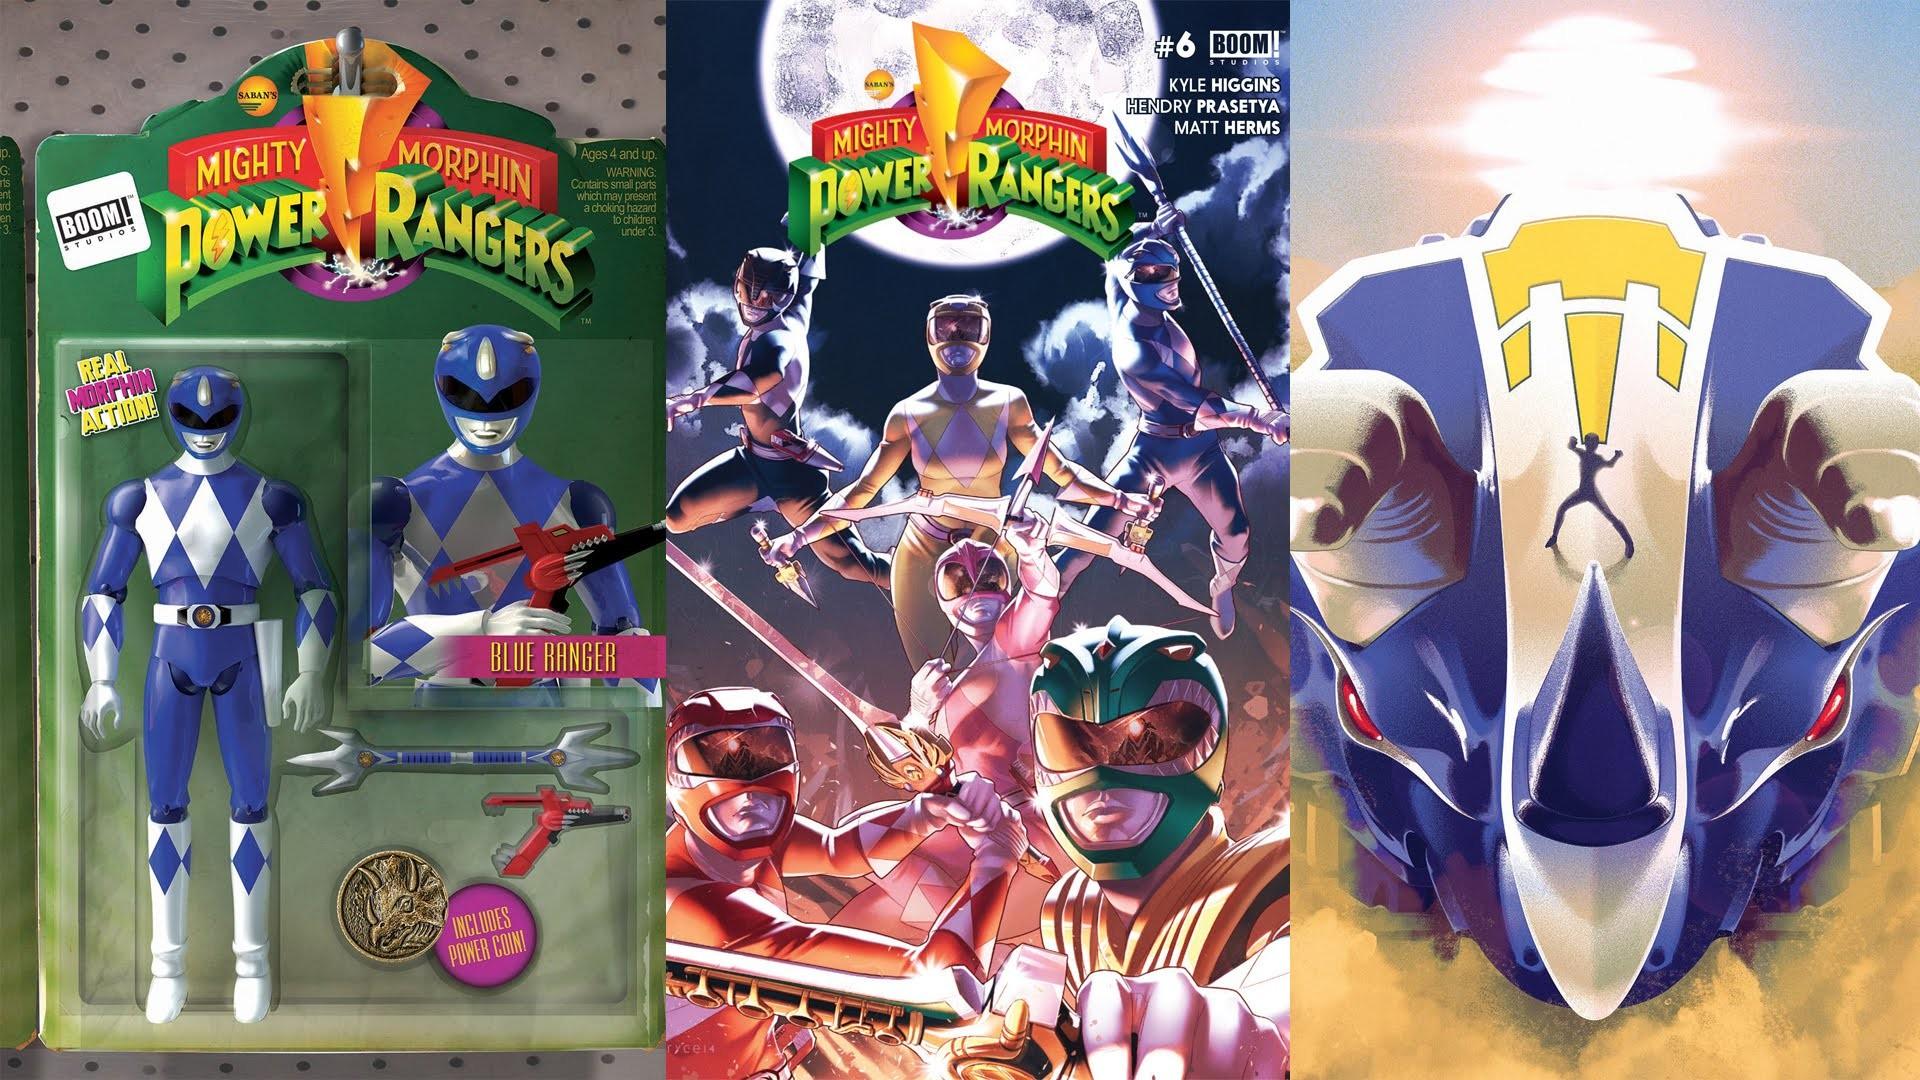 Mighty Morphin Power Rangers BOOM! Studios Comic #6